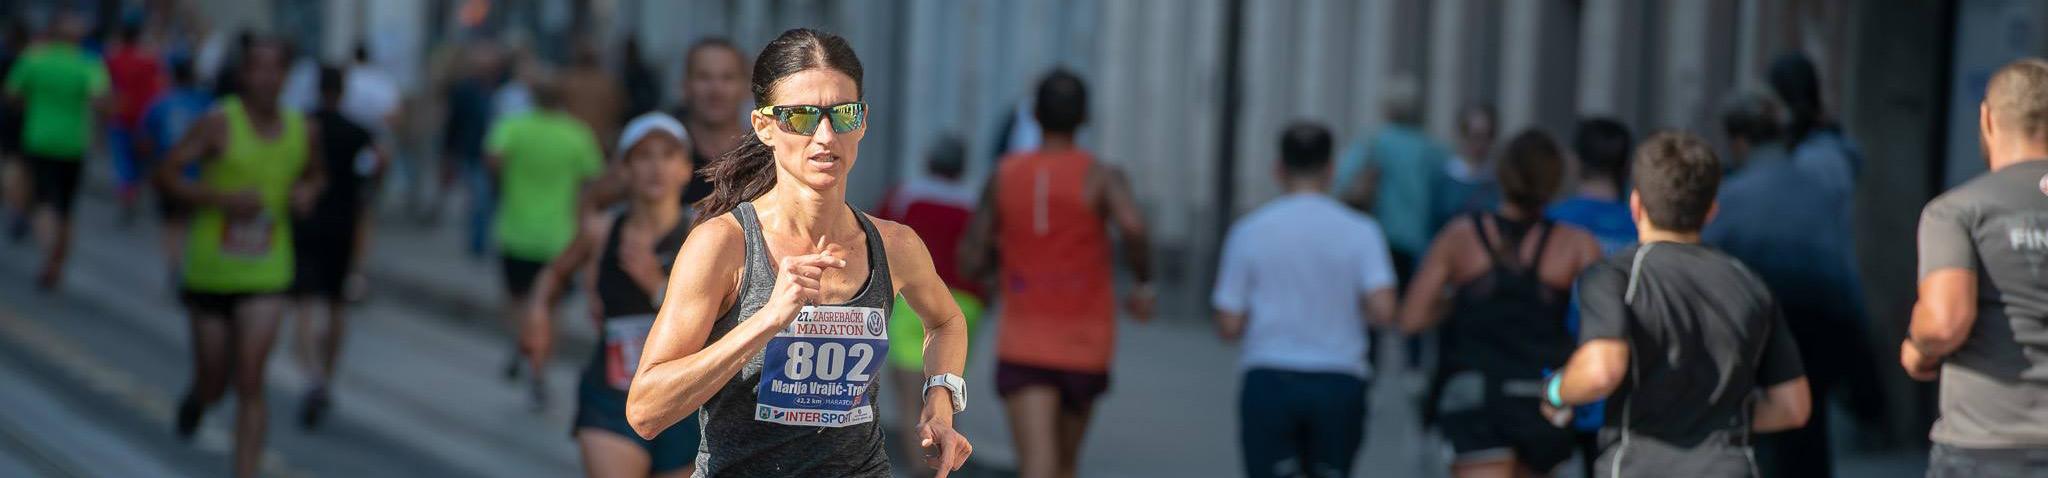 https://www.zagreb-marathon.com/wp-content/uploads/maraton03.jpg